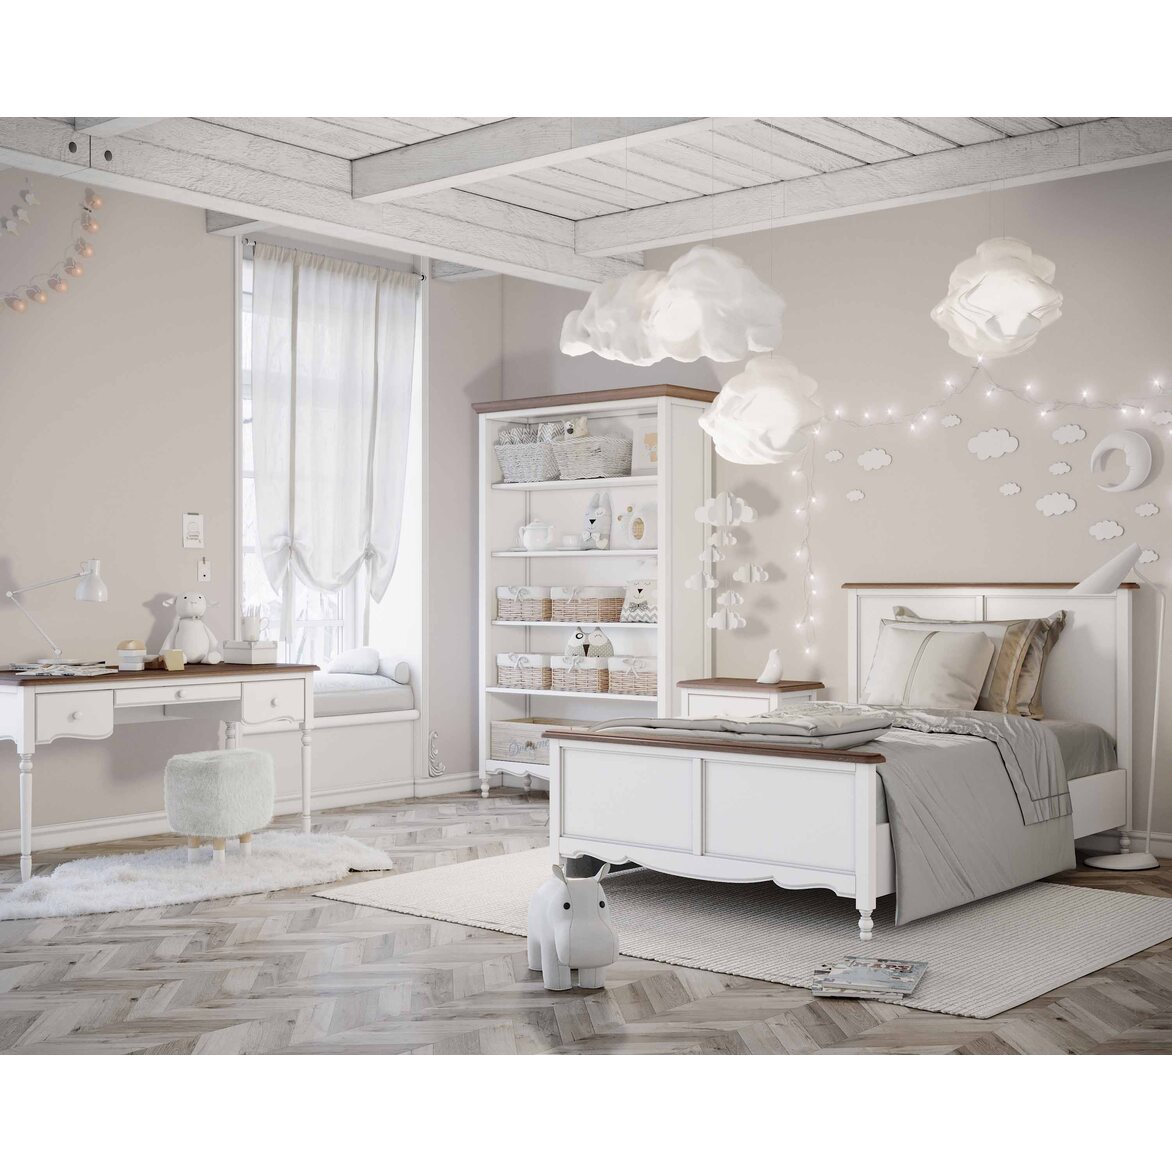 Шкаф двухстворчатый Leblanc, белый 4 | Платяные шкафы Kingsby